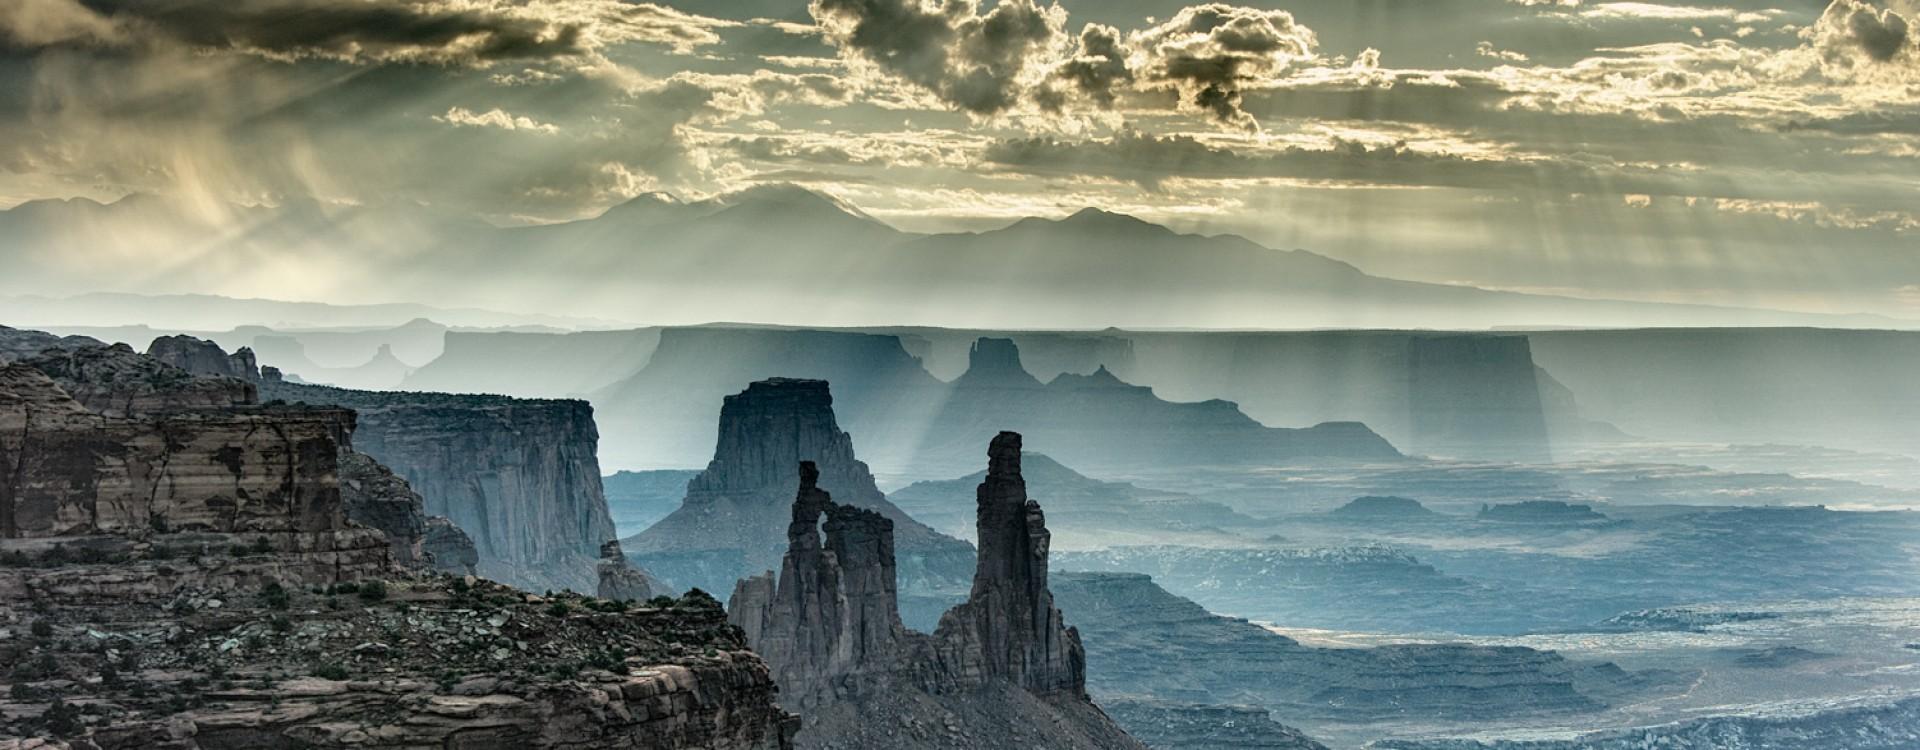 America West Photo Workshop with John Gravett - KE Adventure Travel